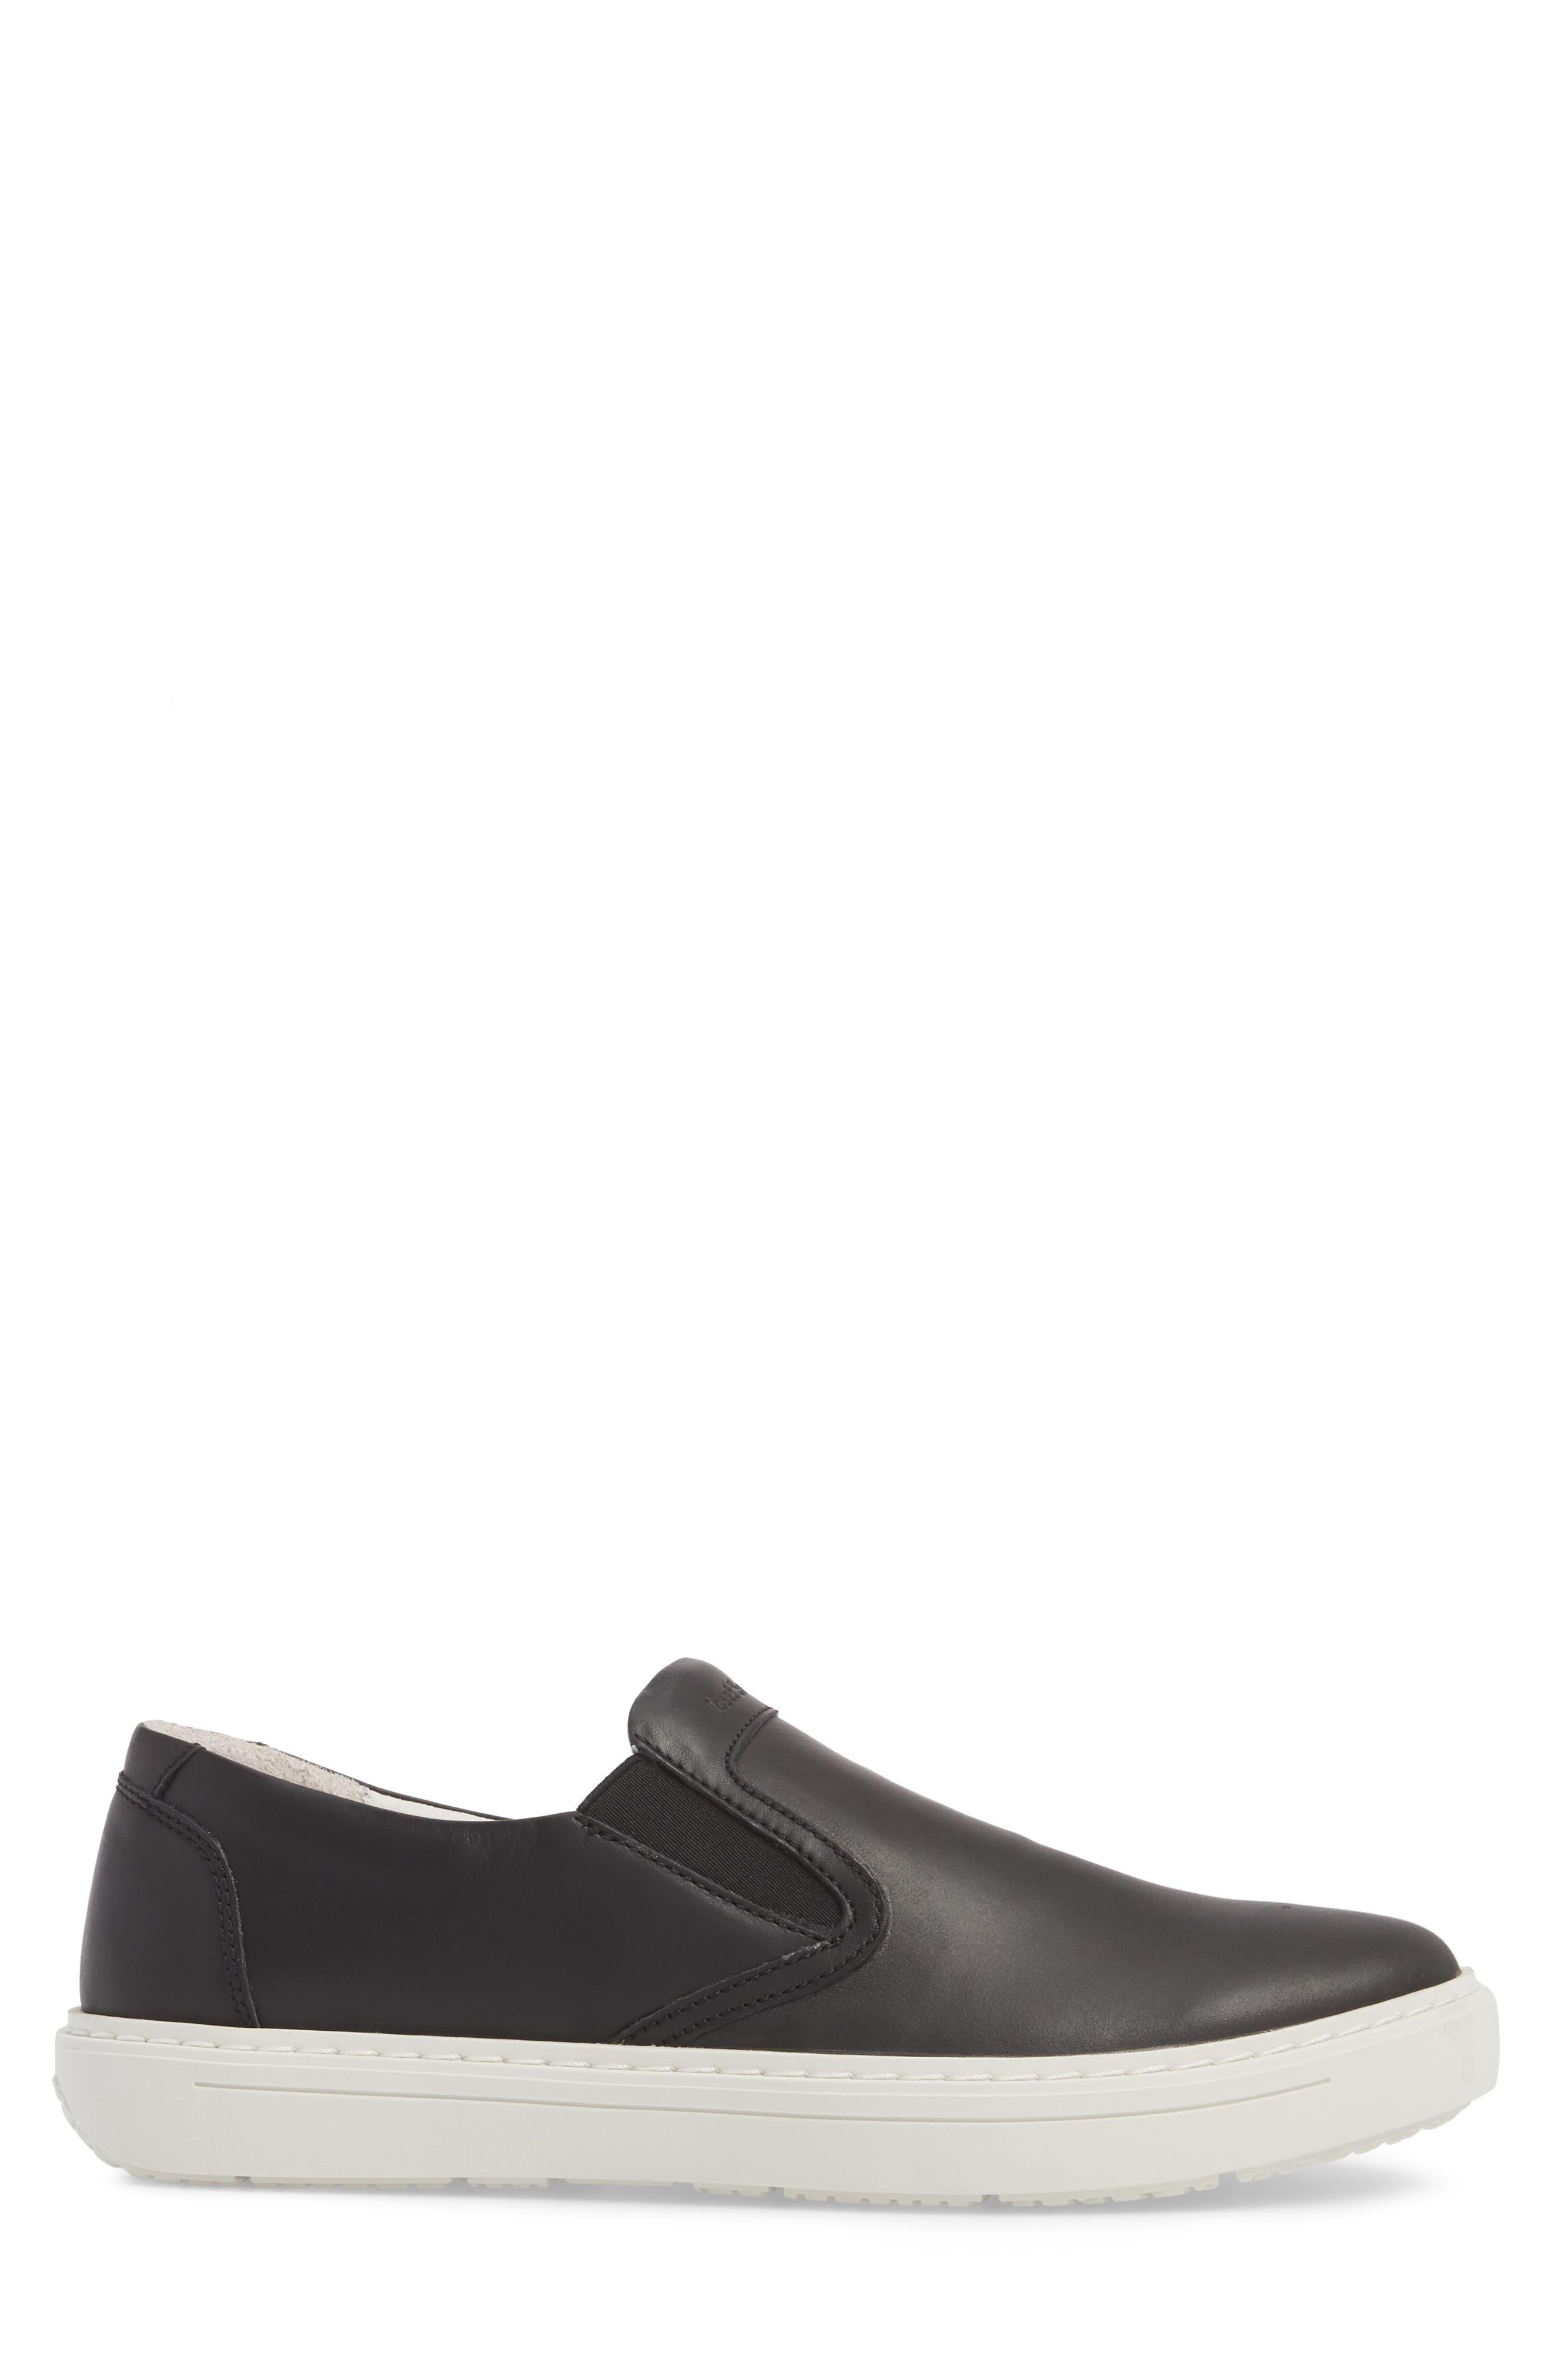 Quentin 15 Slip-On Sneaker,                             Alternate thumbnail 3, color,                             BLACK LEATHER